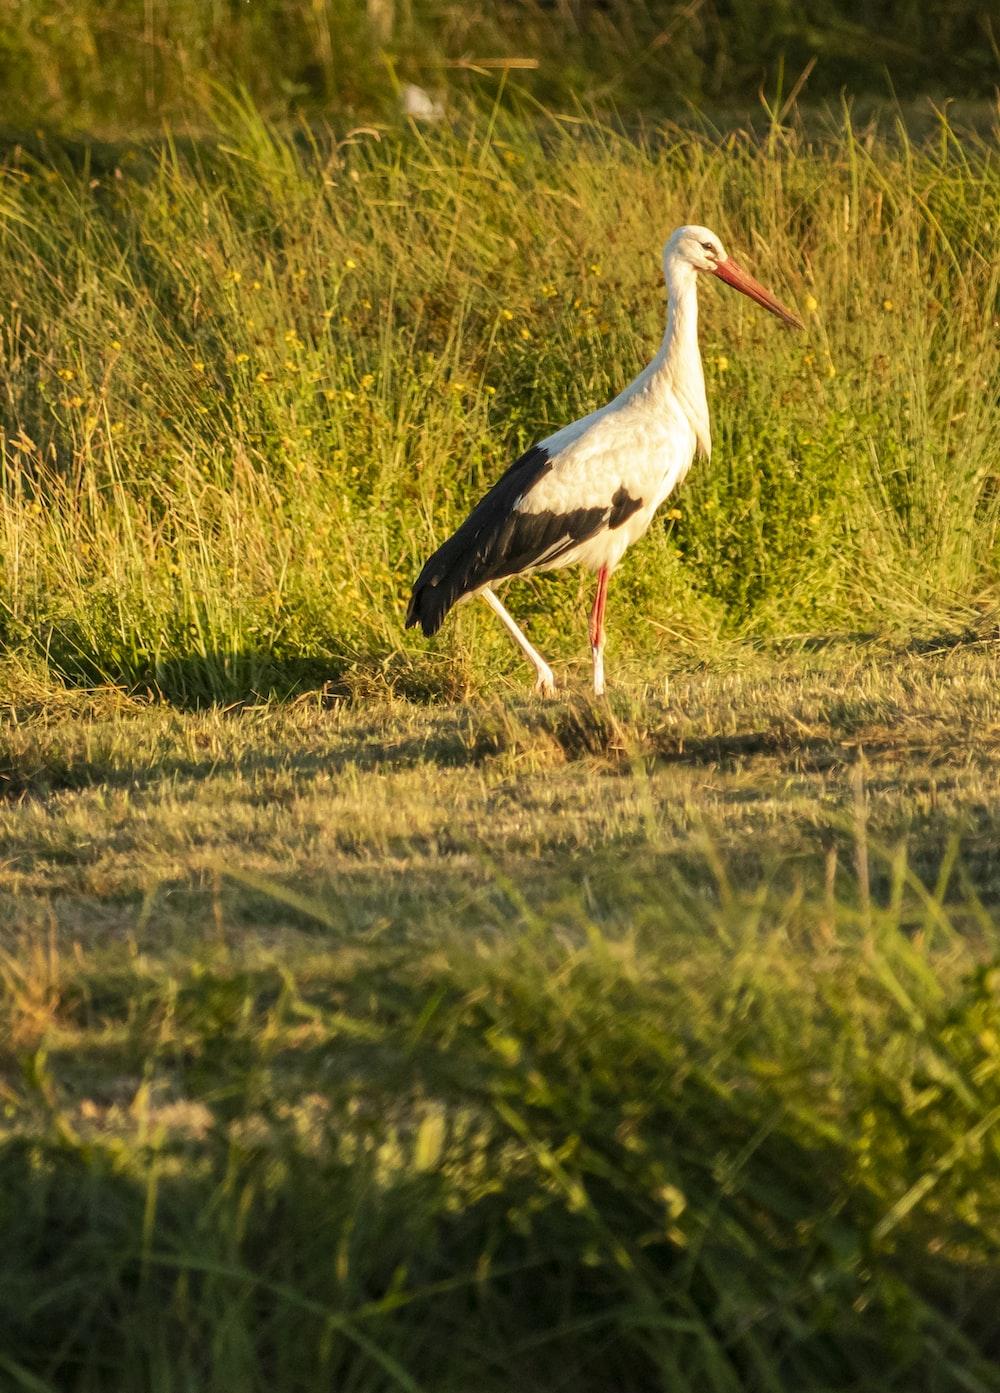 white stork on green grass field during daytime